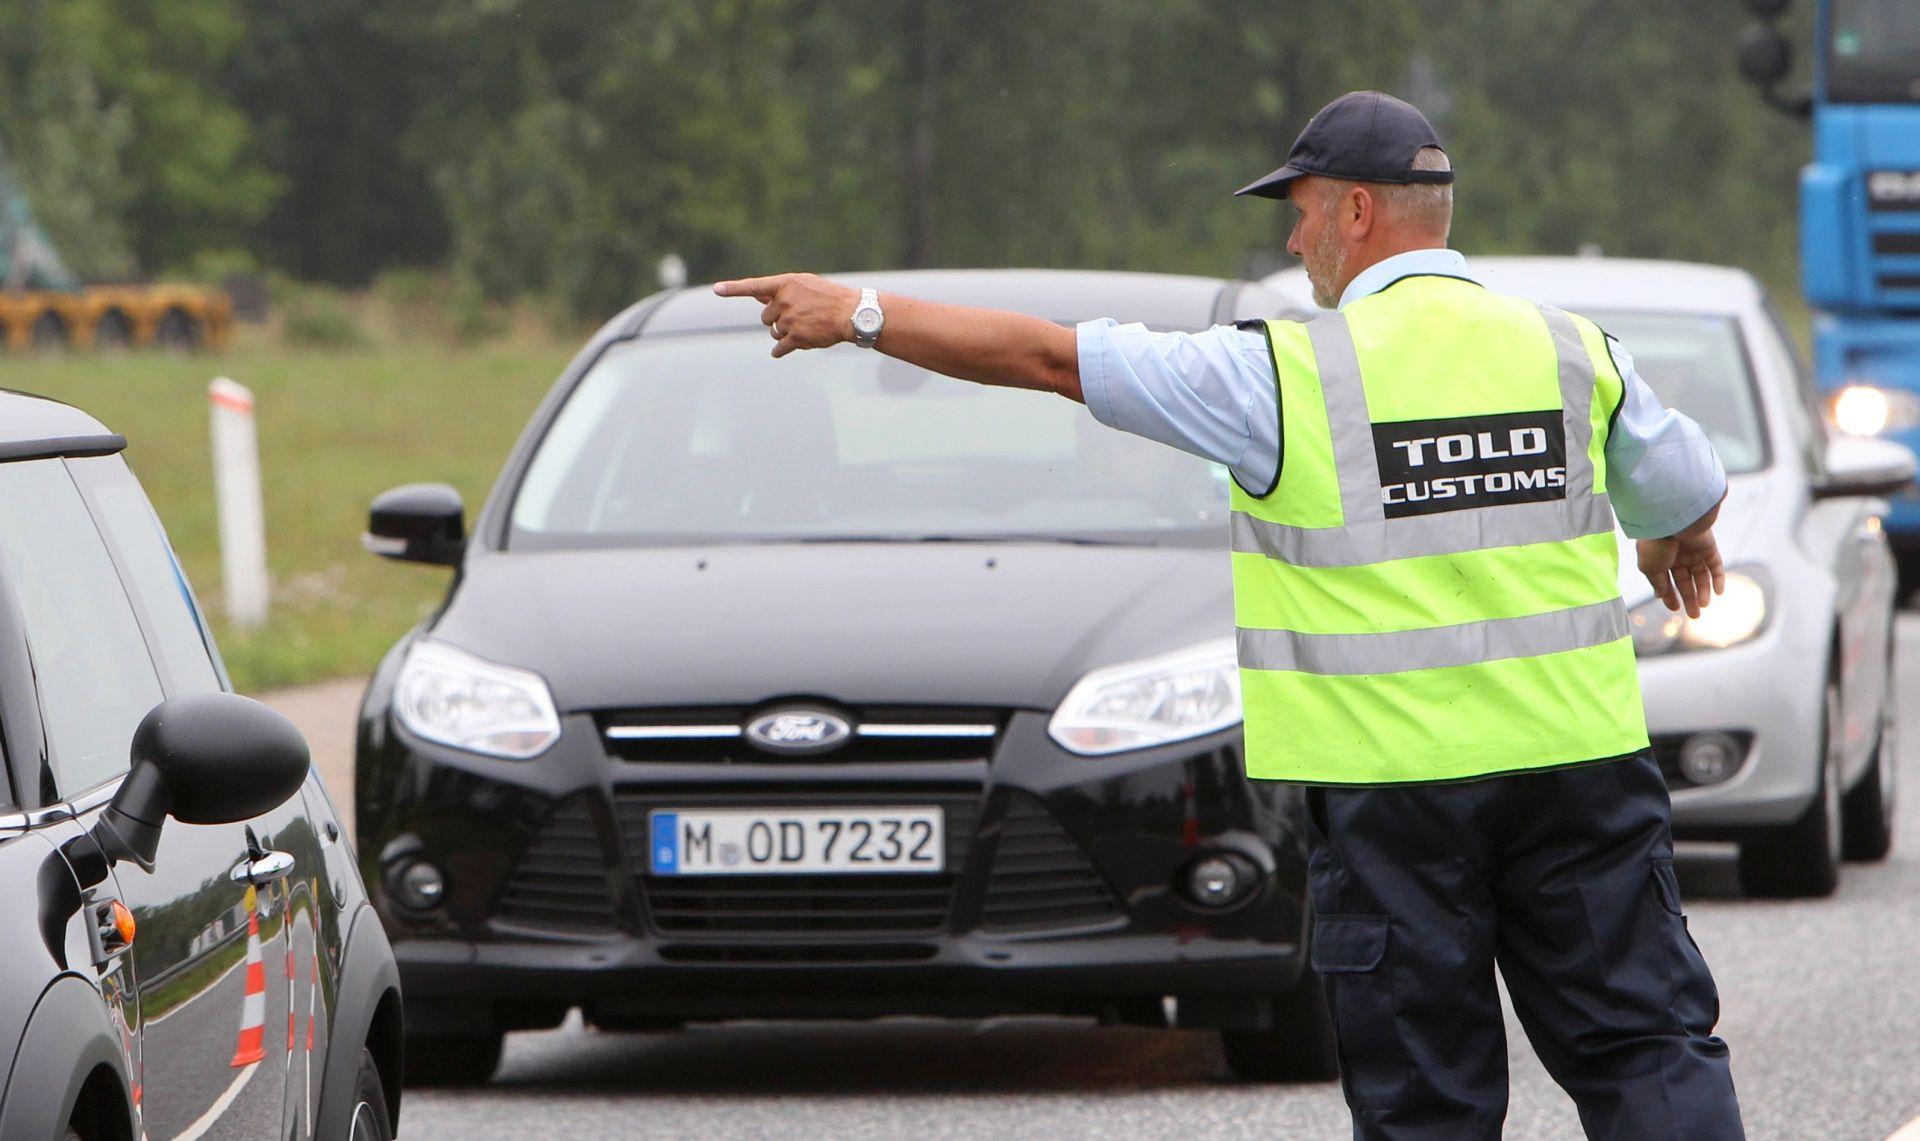 Europa razmatra Schengen nakon napada u vlaku i velikog broja imigranta